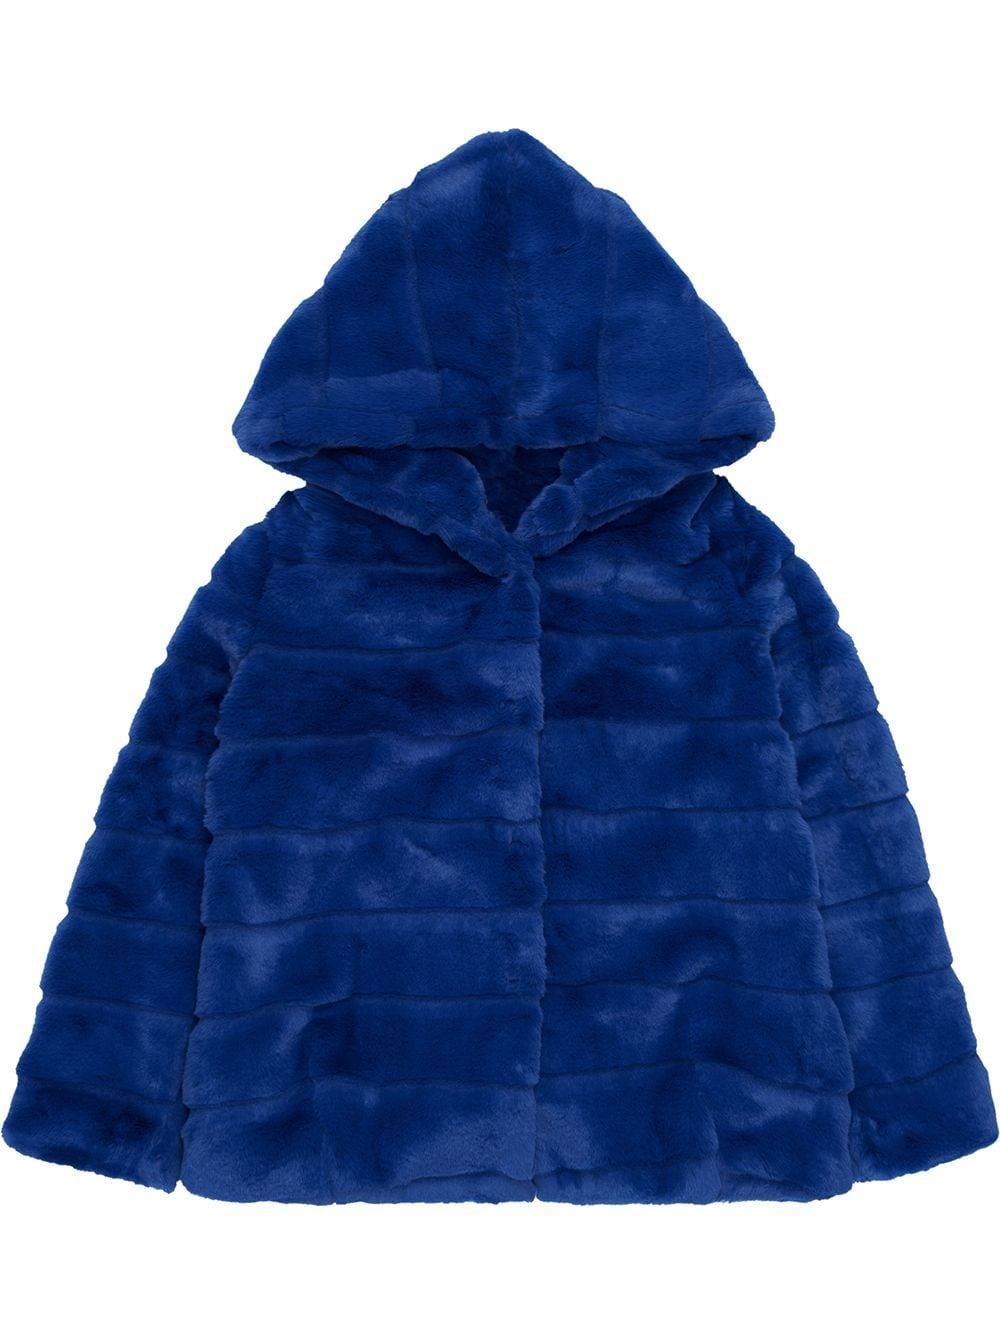 Goldie Faux Fur Hooded Jacket Item # F20128TB